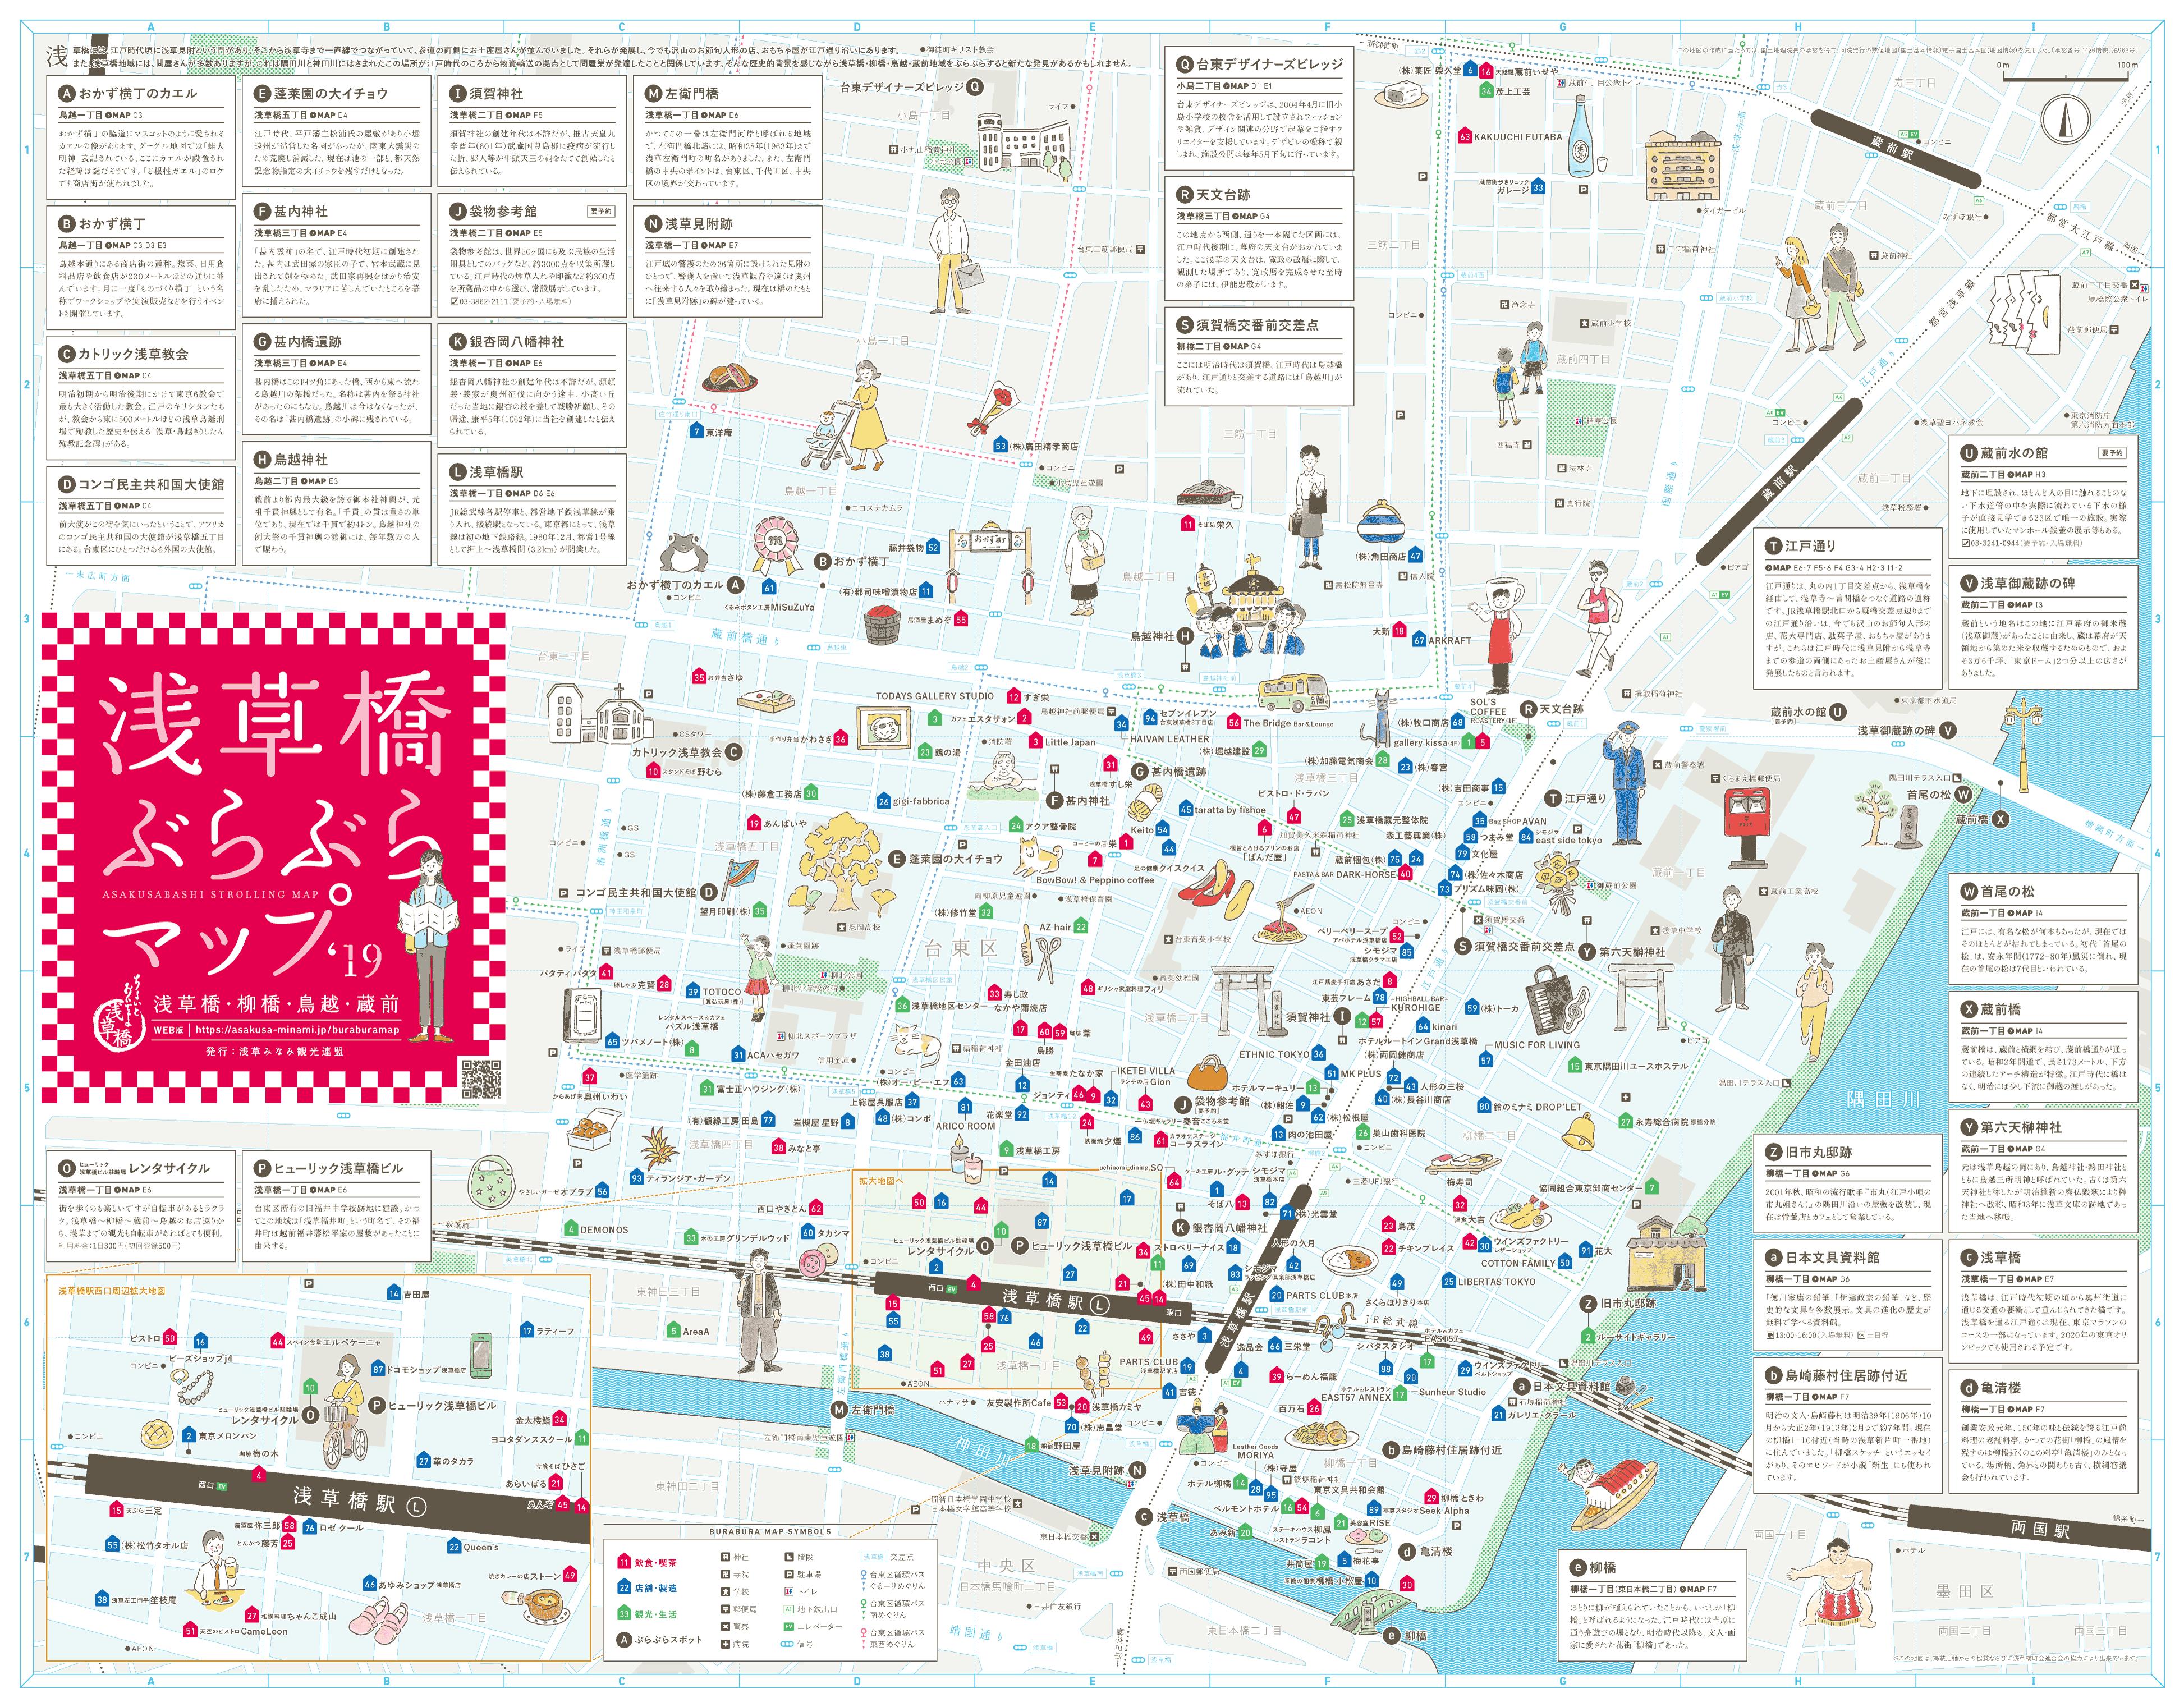 abm_jp_map_190415